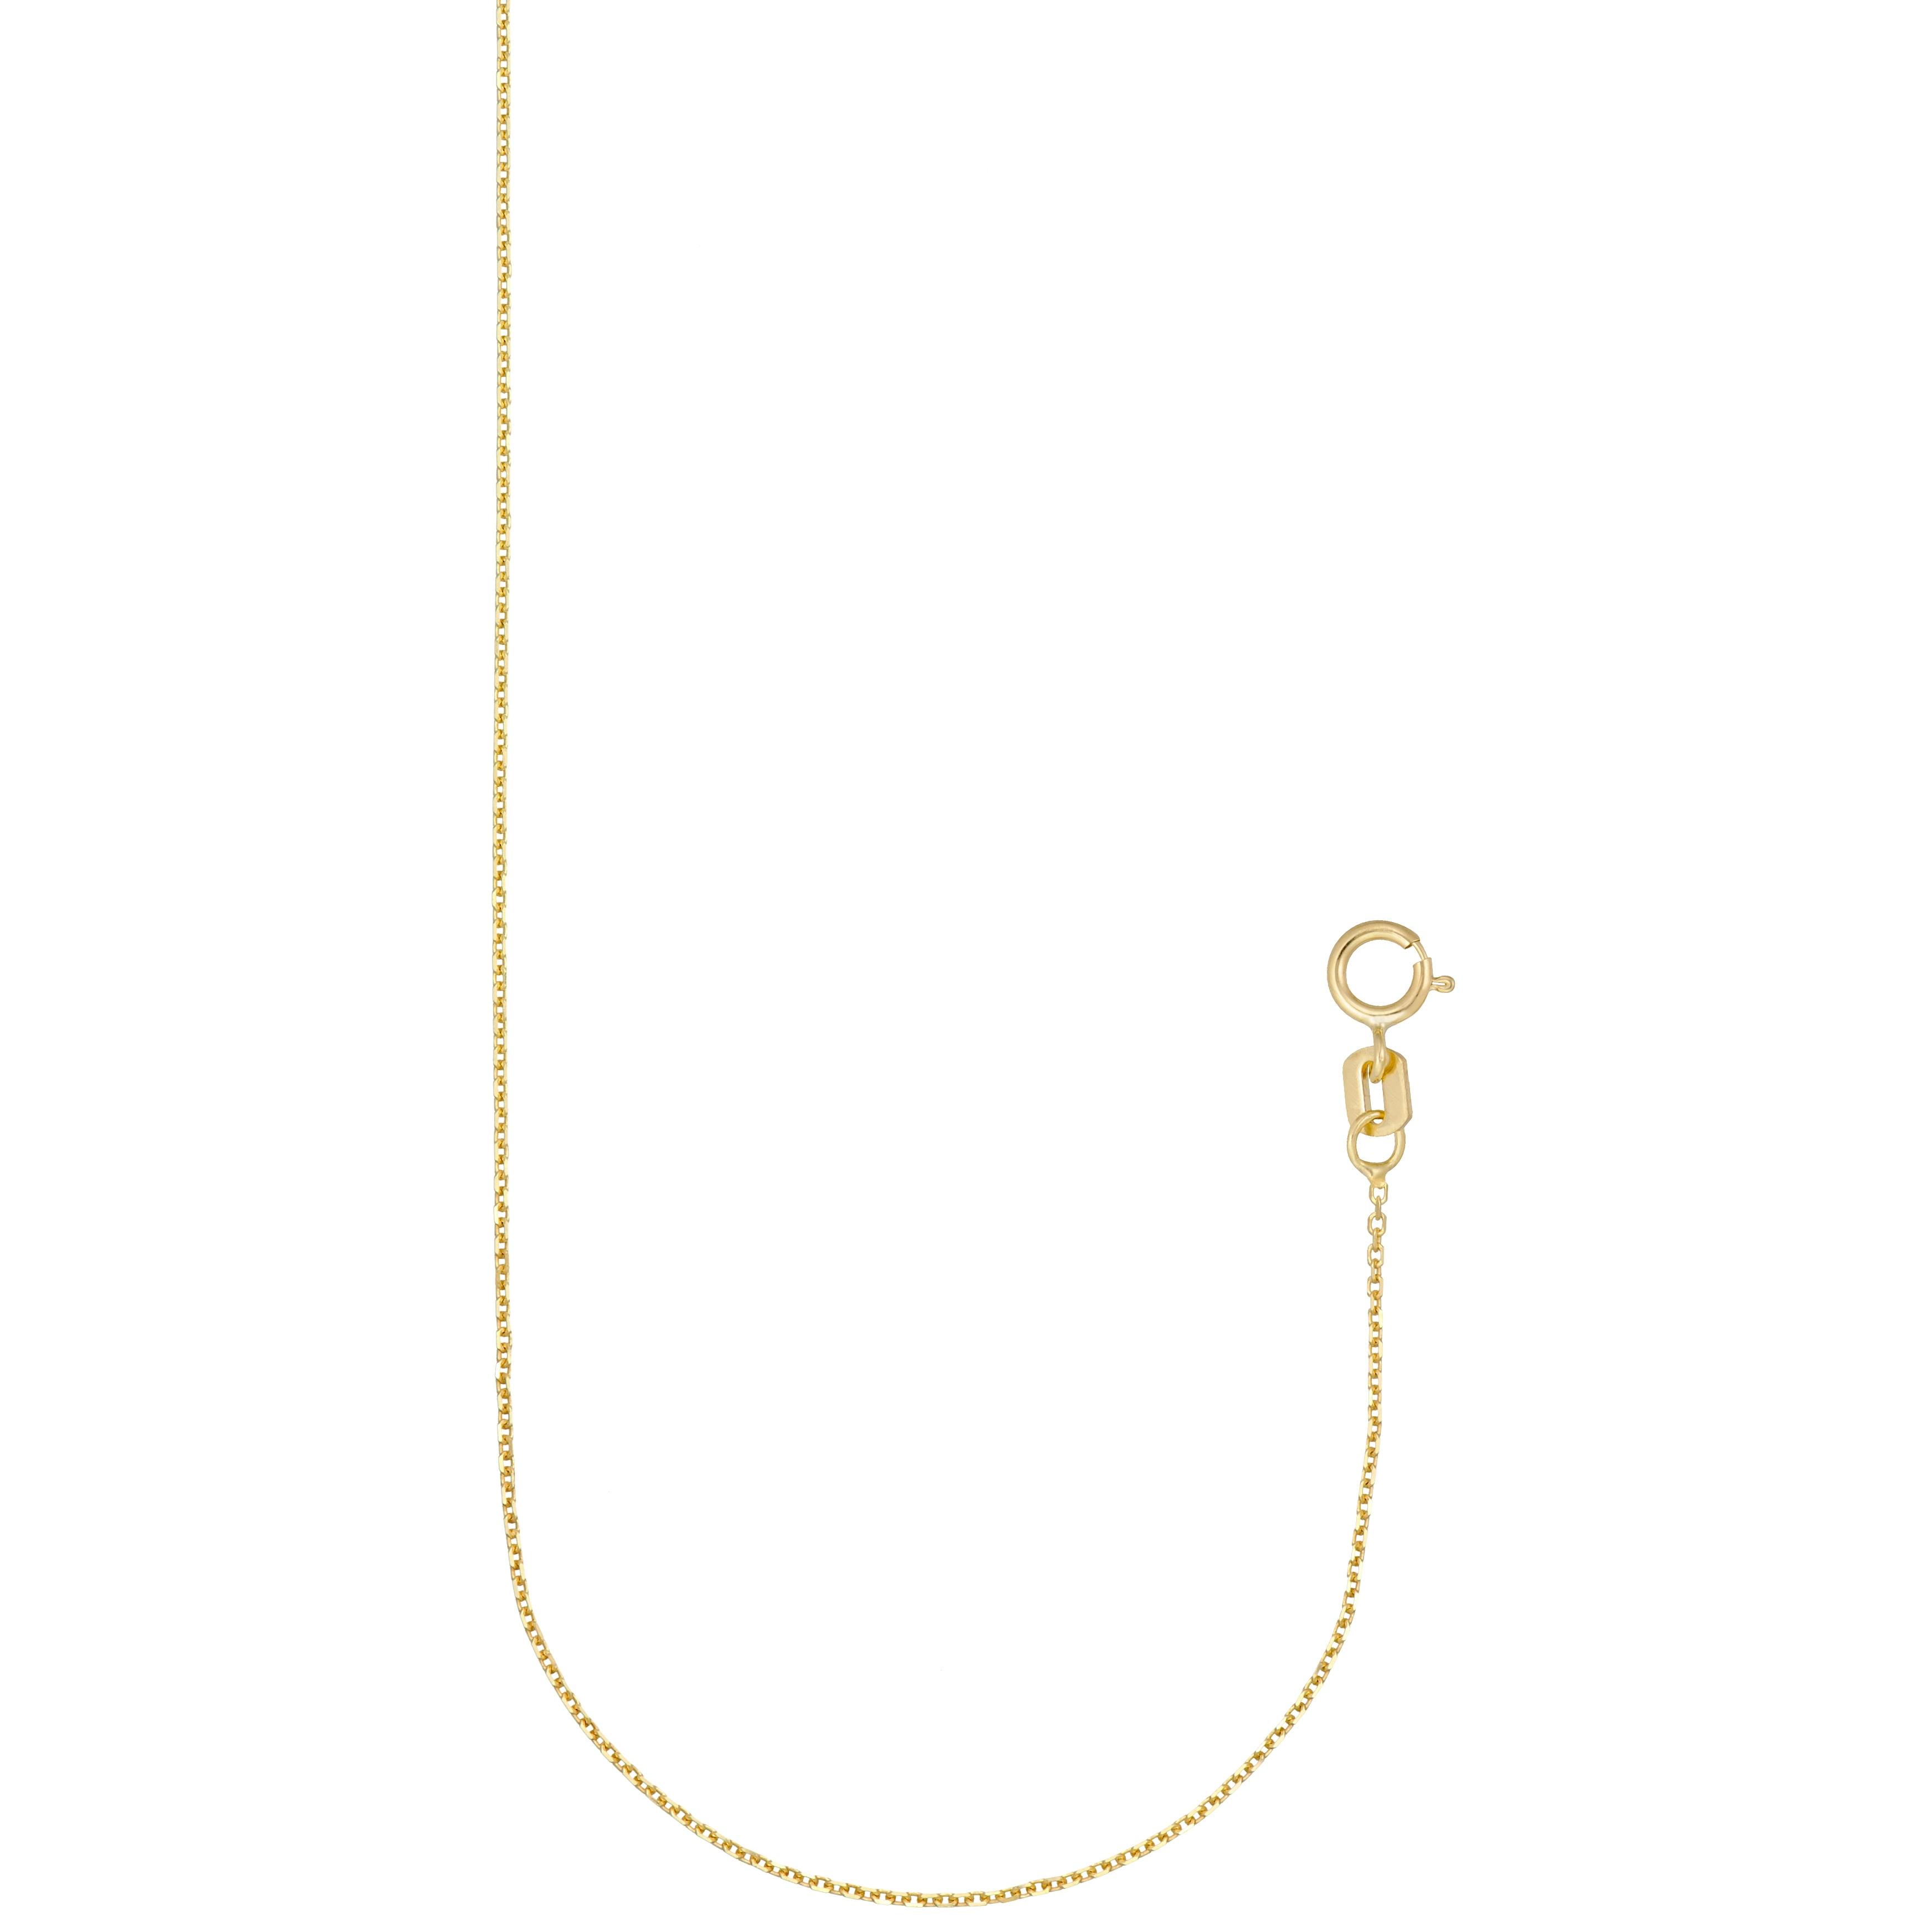 10 kt gold chain 18